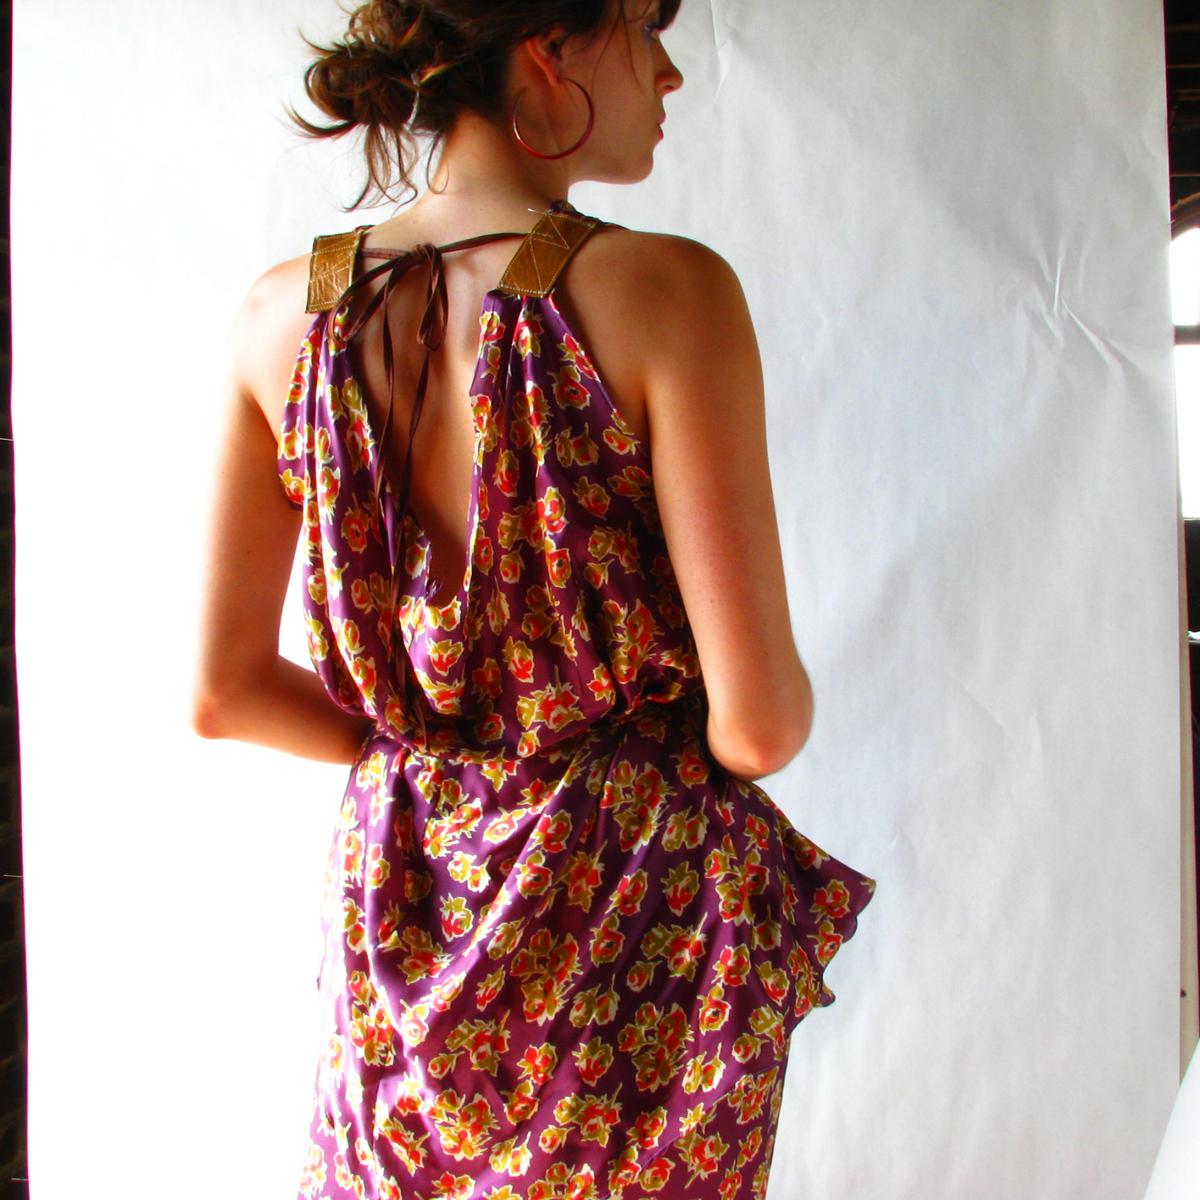 los-angeles-dress-silk-set_3773251428_o.jpg